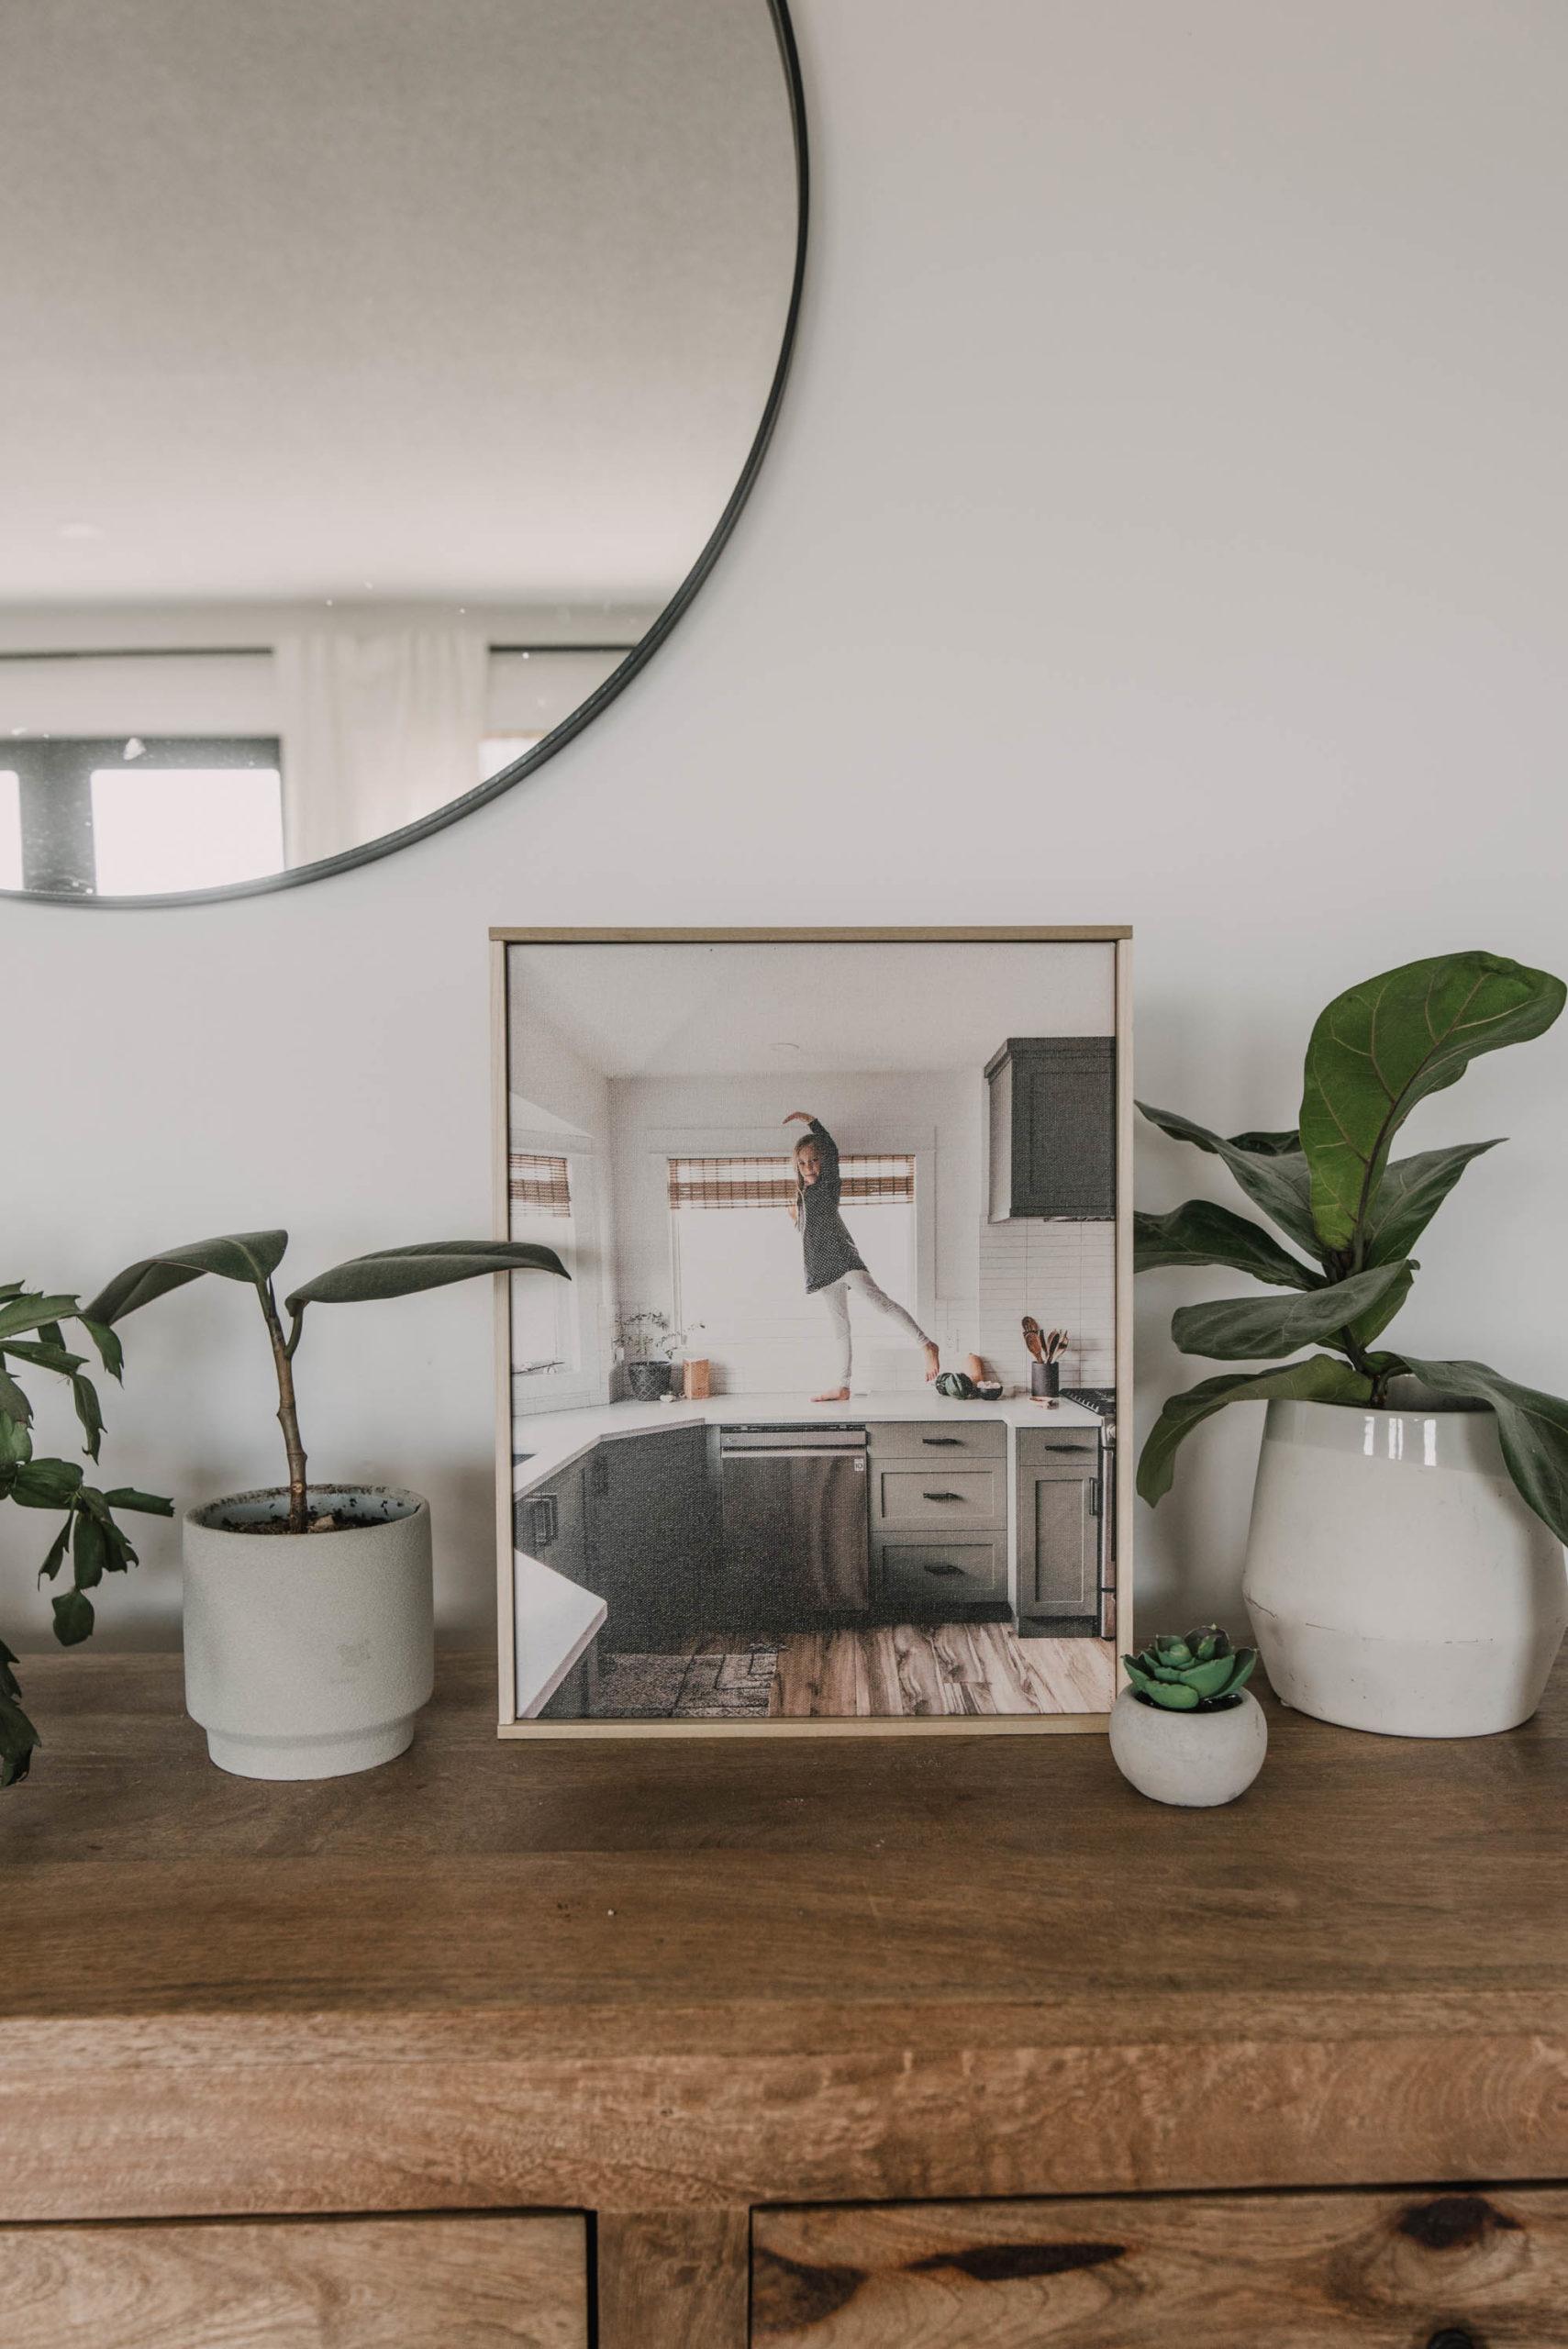 Modern Canvas Frame for under $10